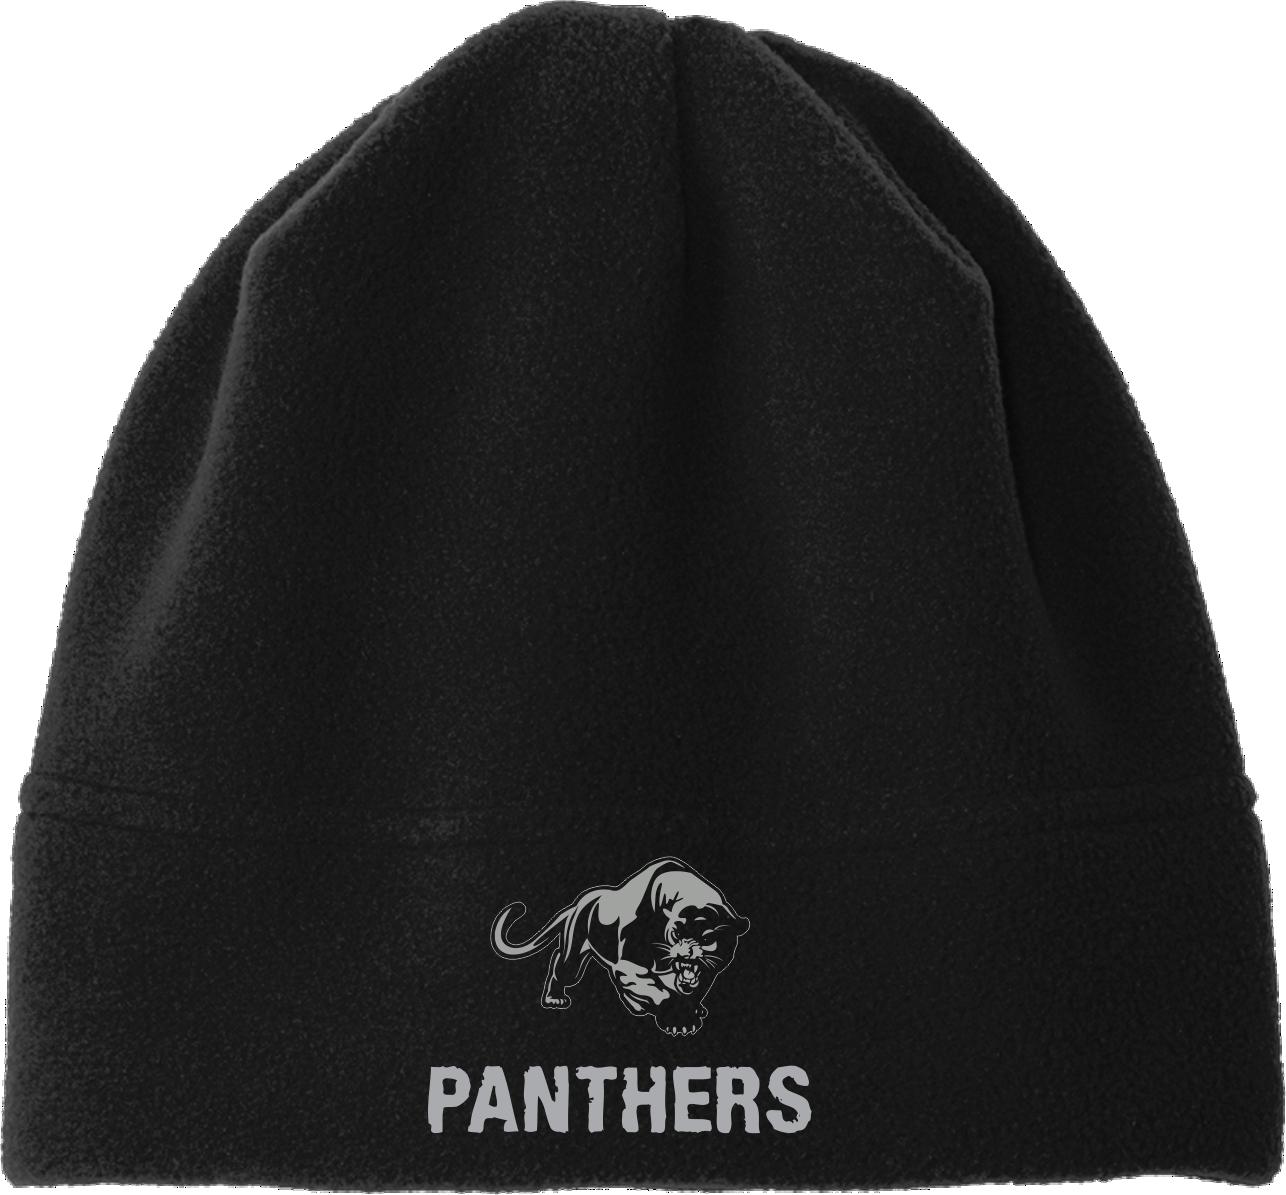 Panthers Black Beanie PPBB